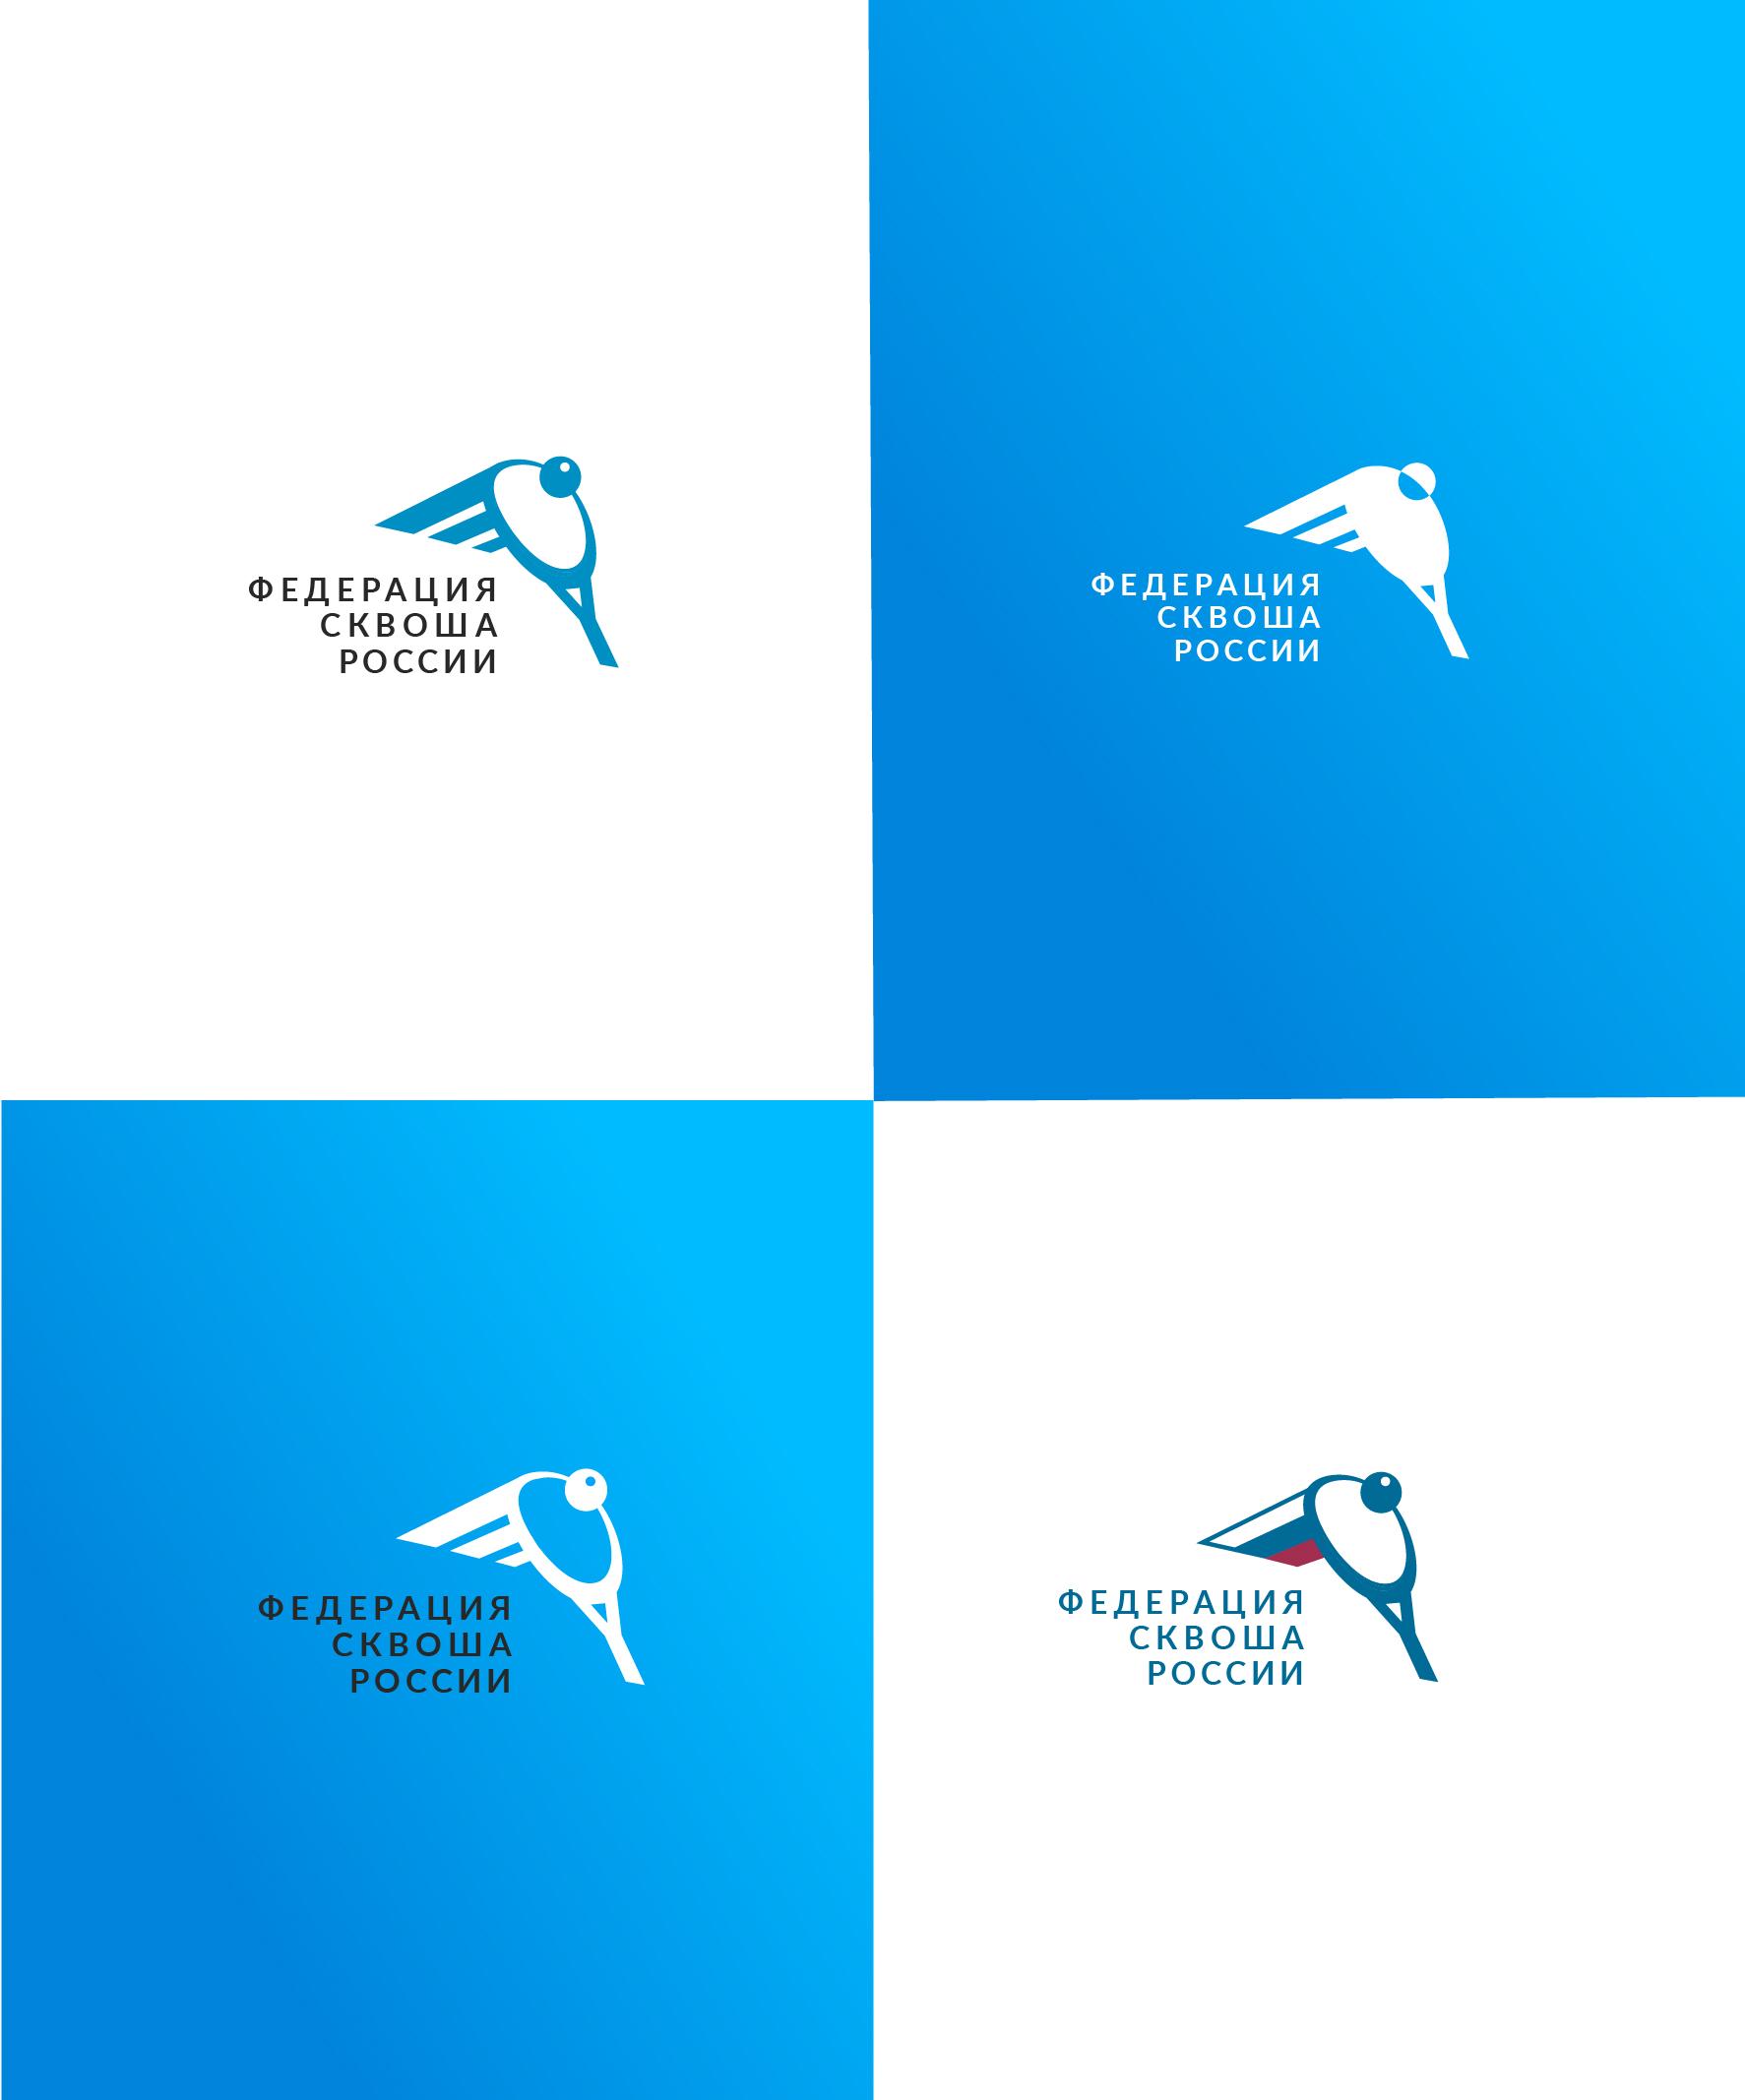 Разработать логотип для Федерации сквоша России фото f_6675f327f0f7d054.jpg